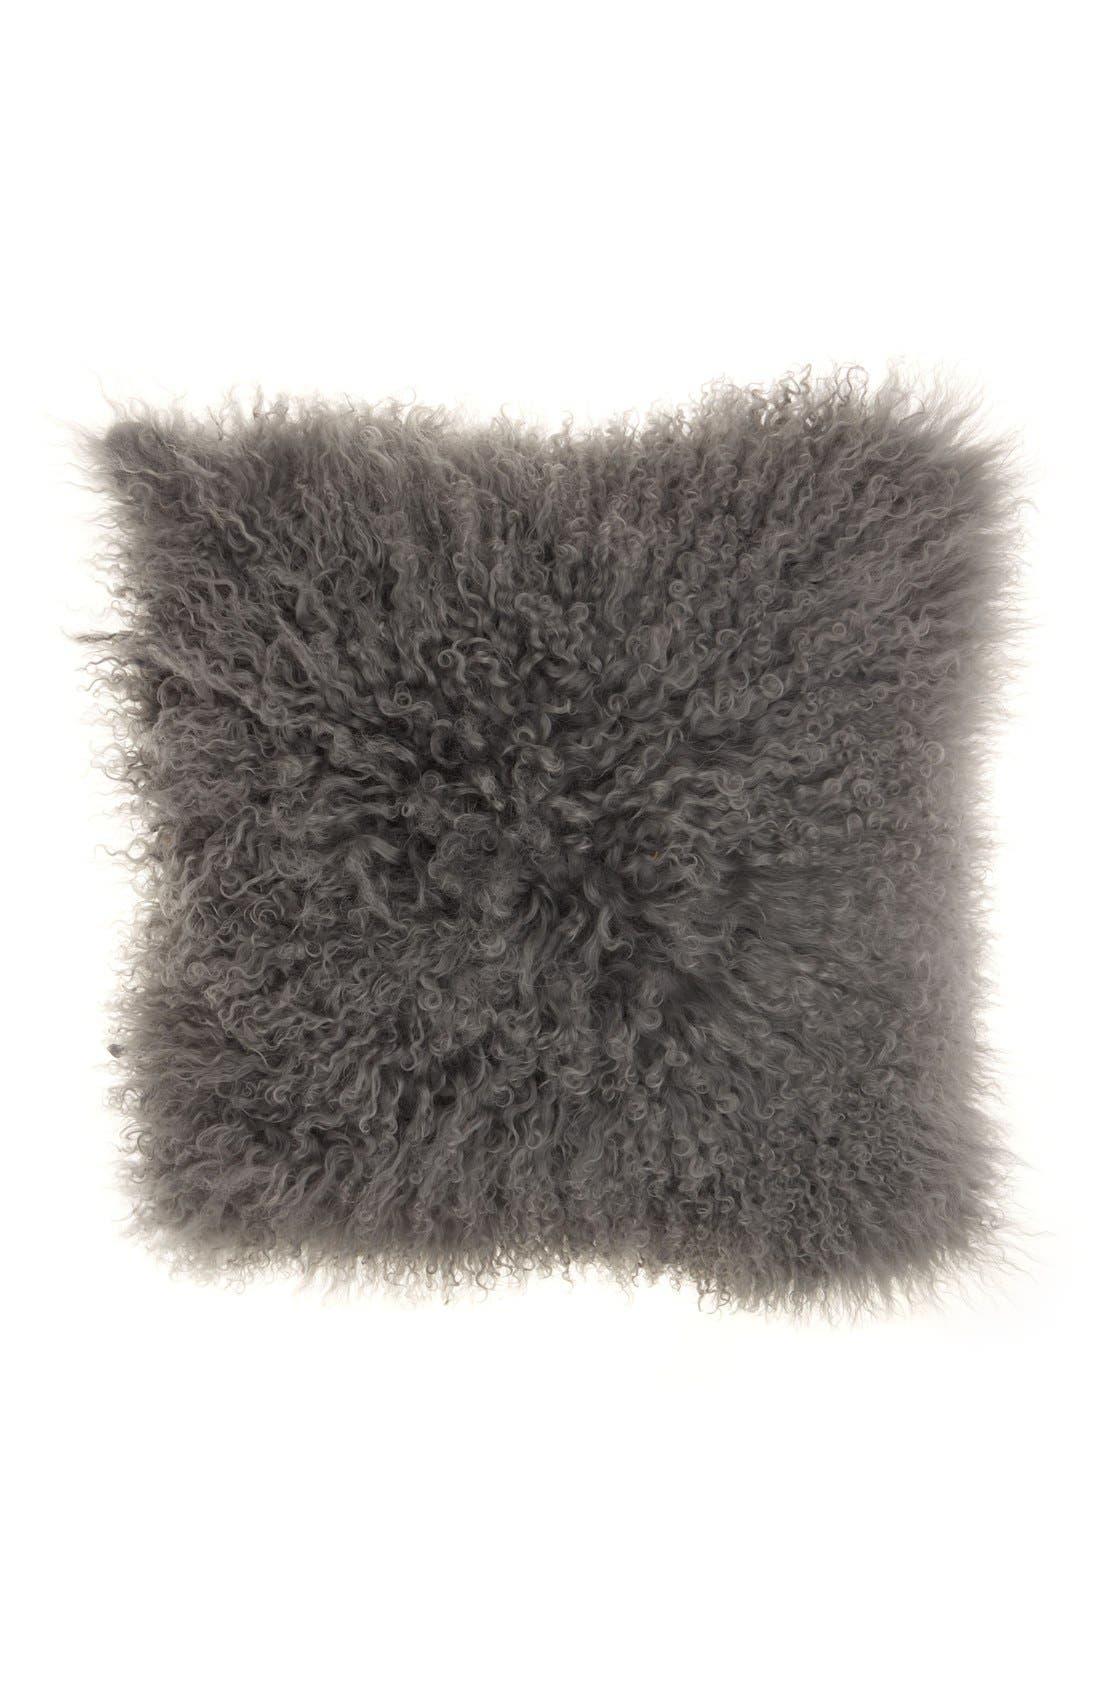 Genuine Tibetan Wool Shearling Pillow,                         Main,                         color, SILVER/ GREY